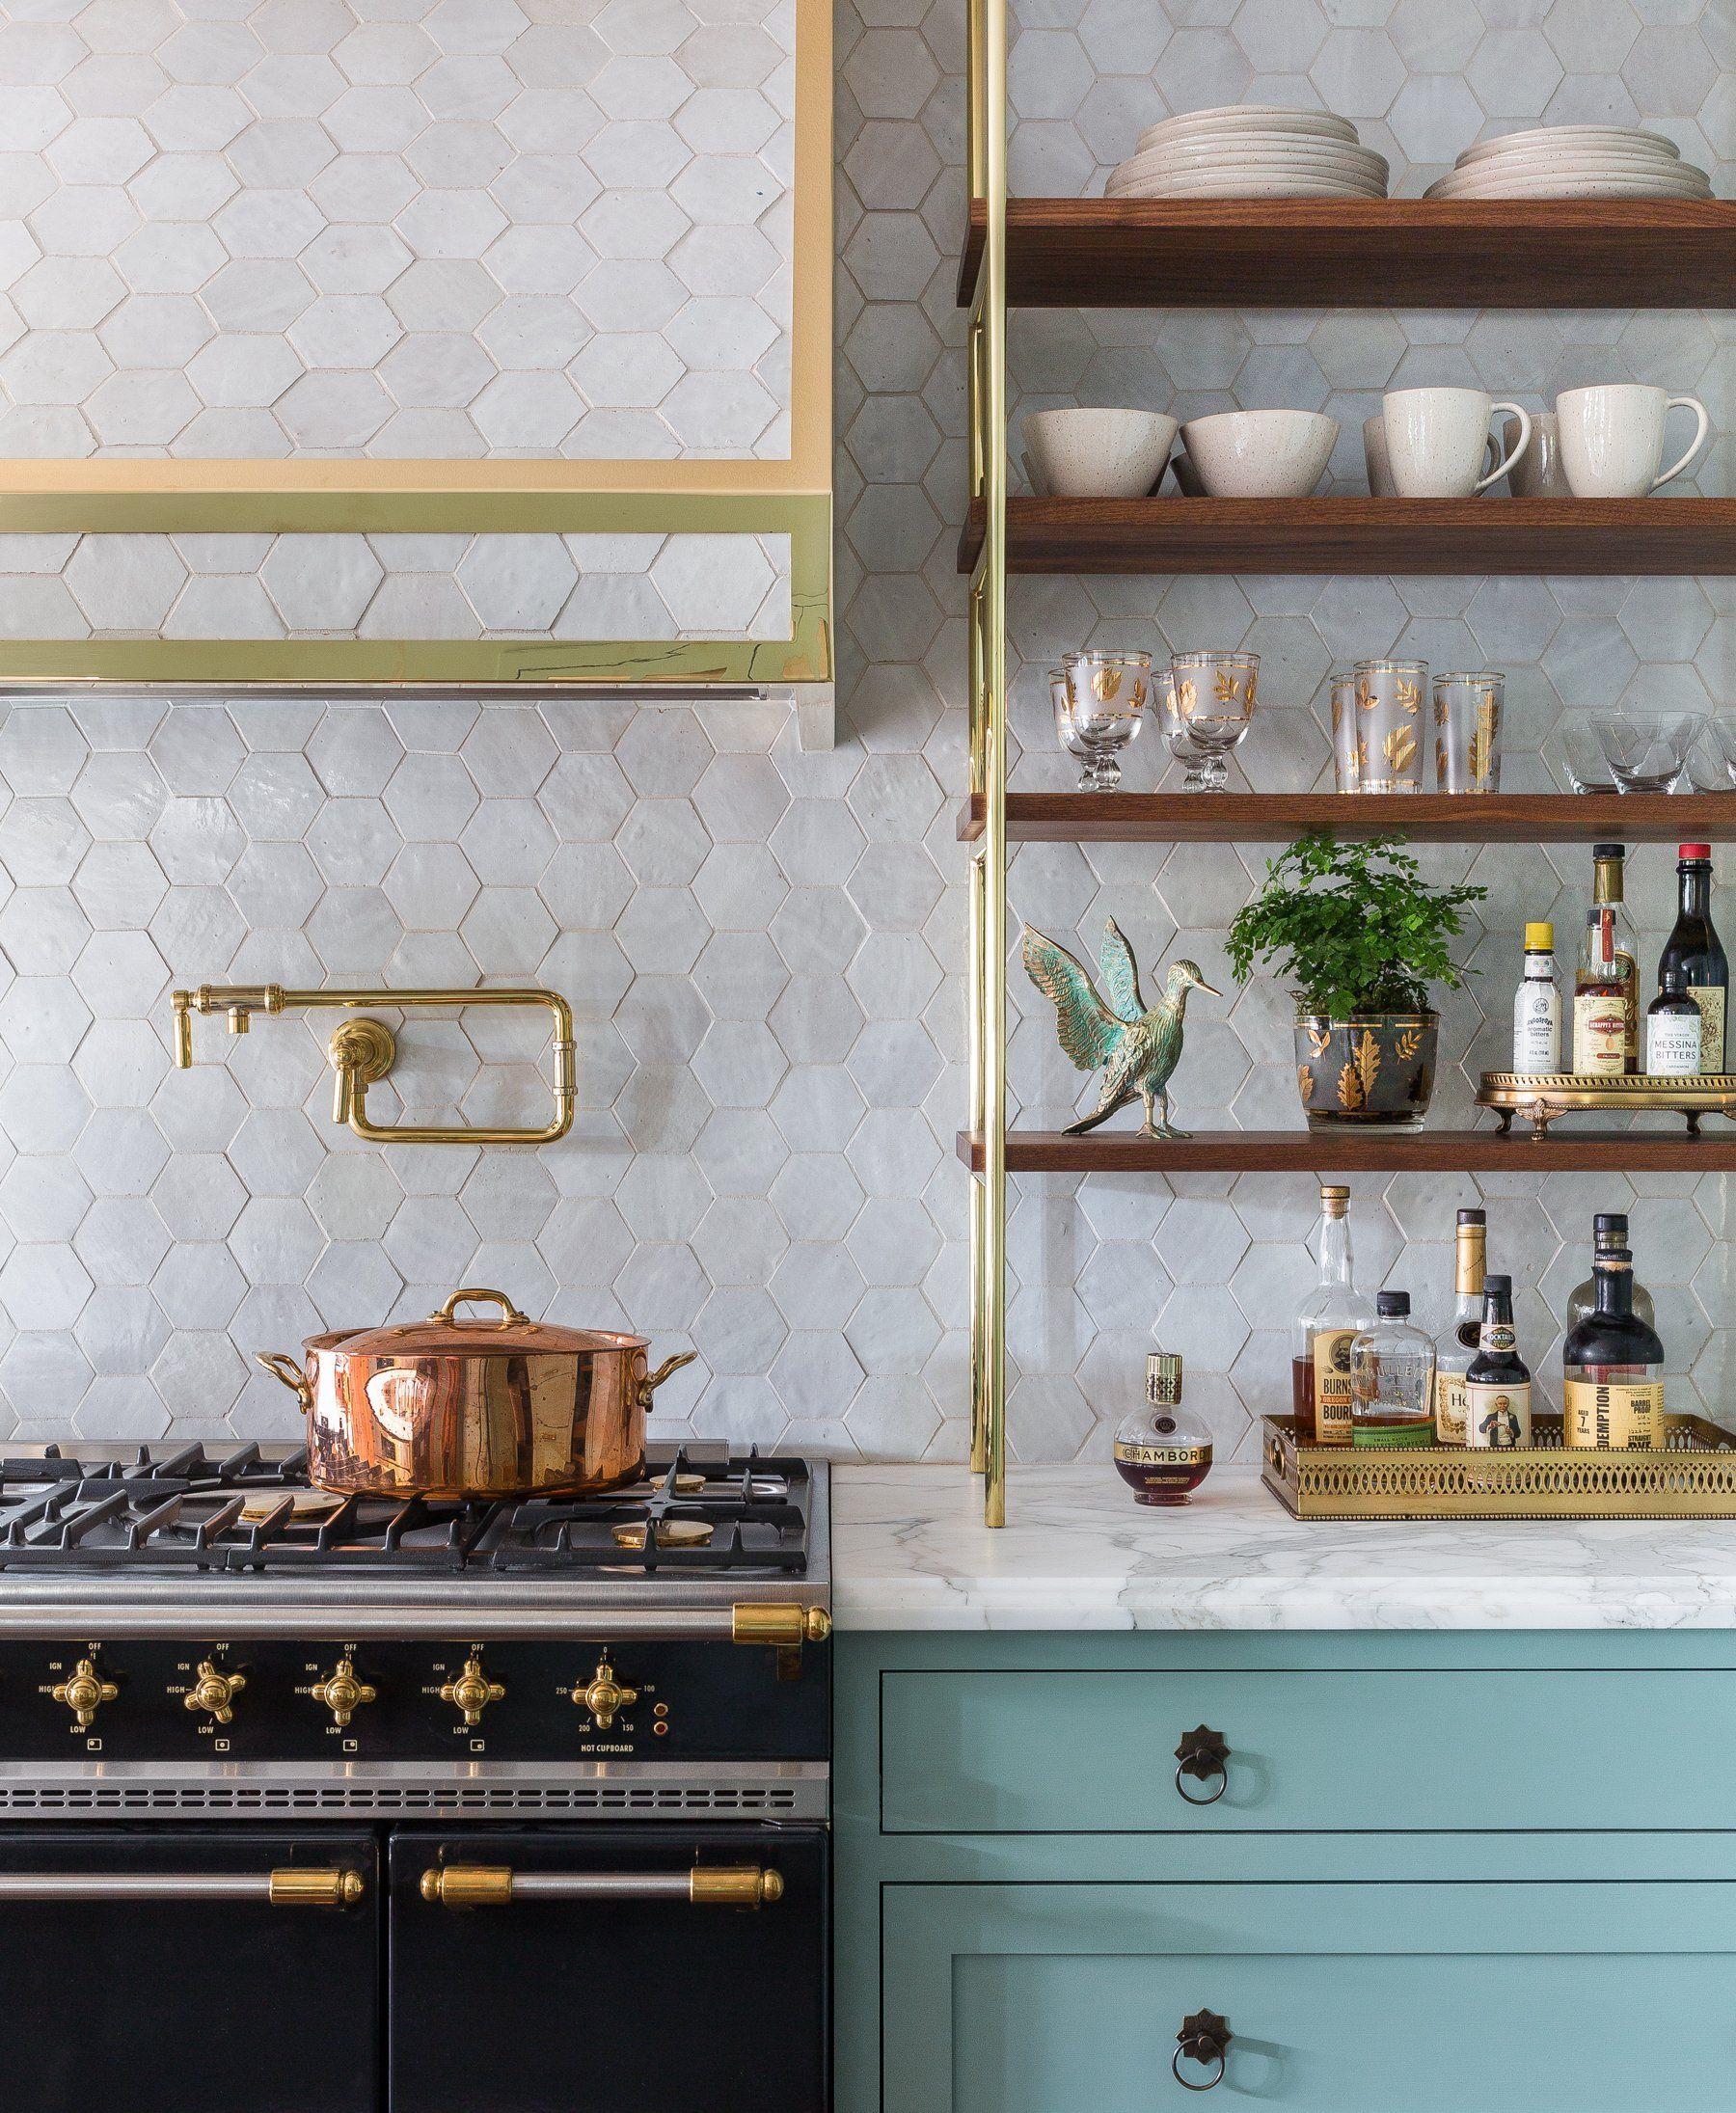 Kitchen in portland or by jhl design kitchen in pinterest